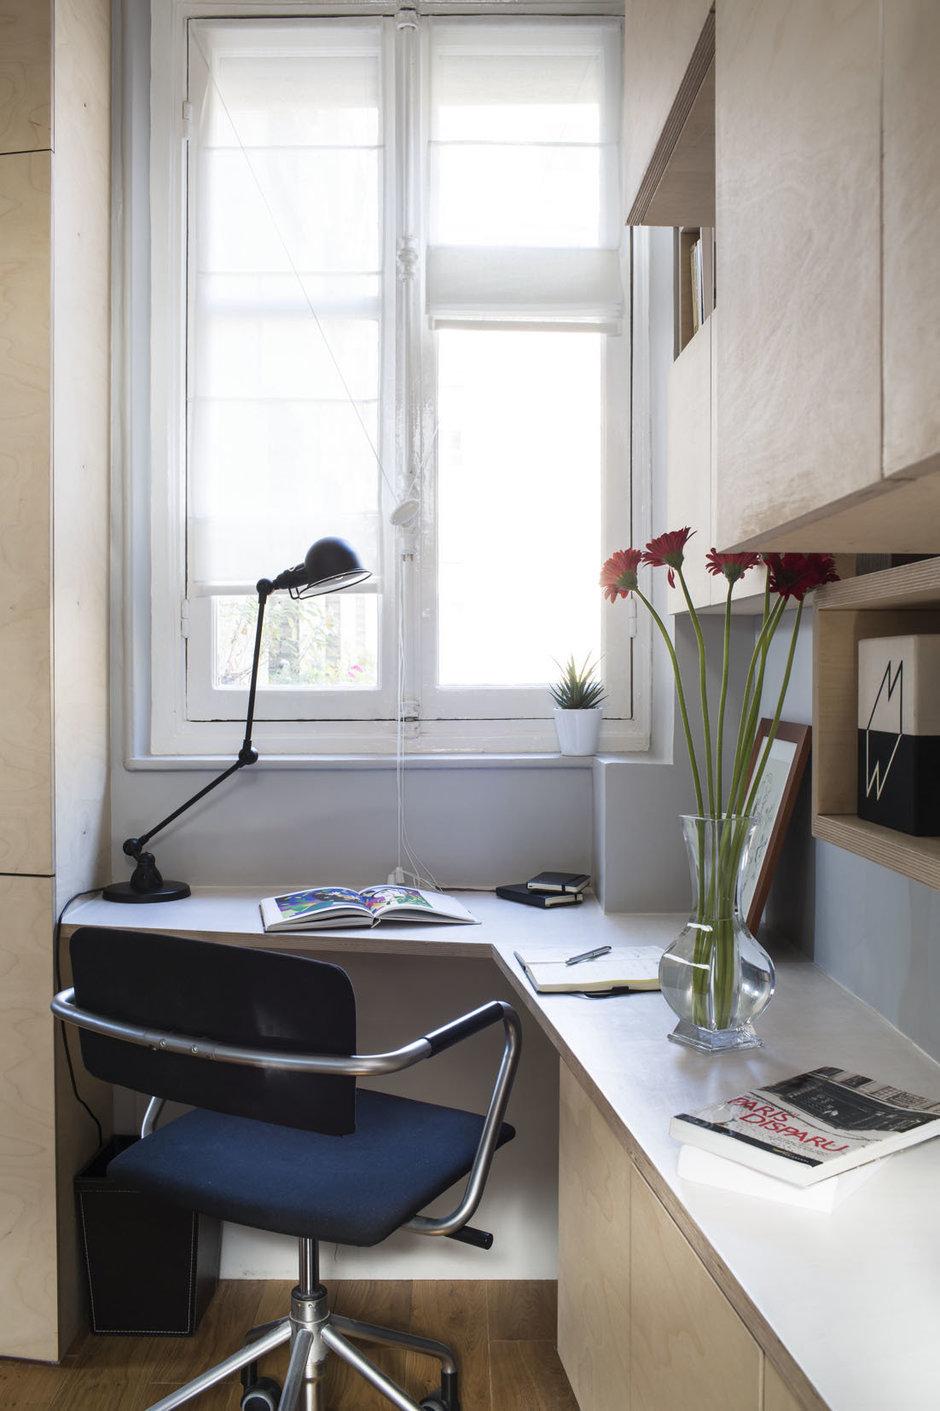 Фотография: Офис в стиле Современный, Лофт, Малогабаритная квартира, Квартира, Дома и квартиры – фото на InMyRoom.ru